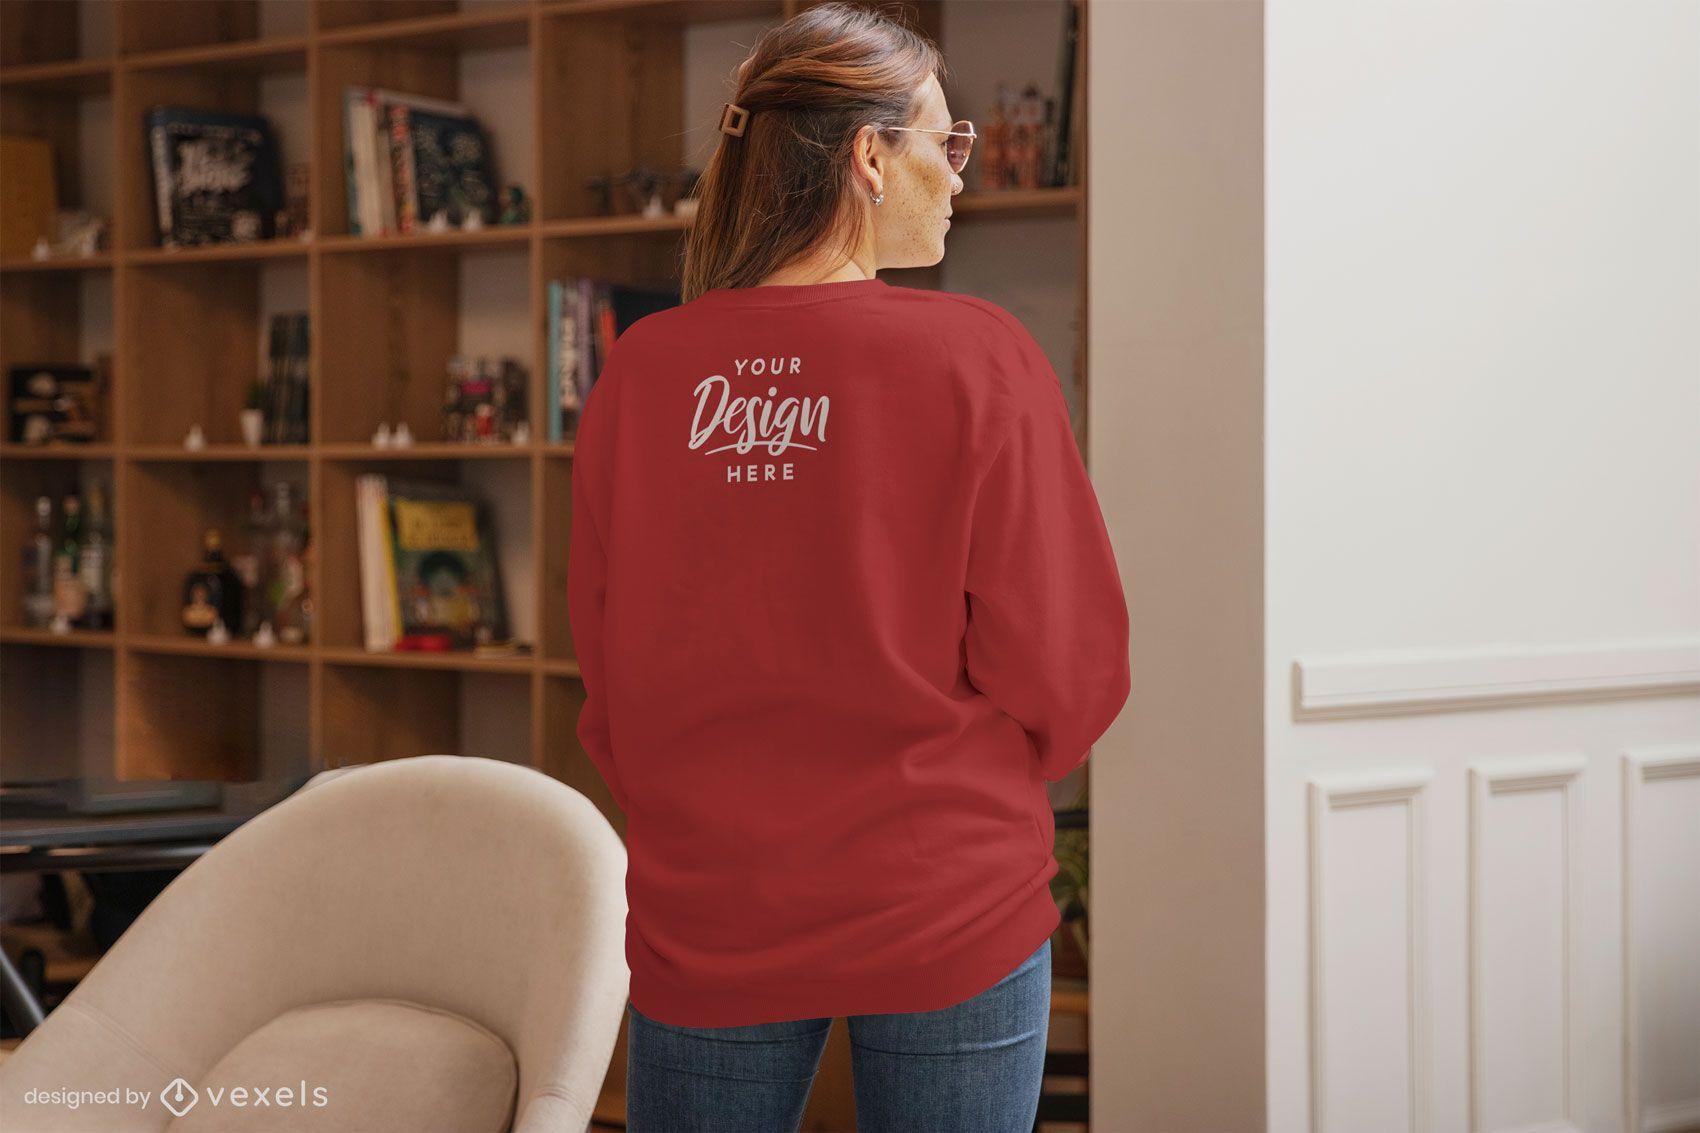 Woman backwards sweatshirt home mockup